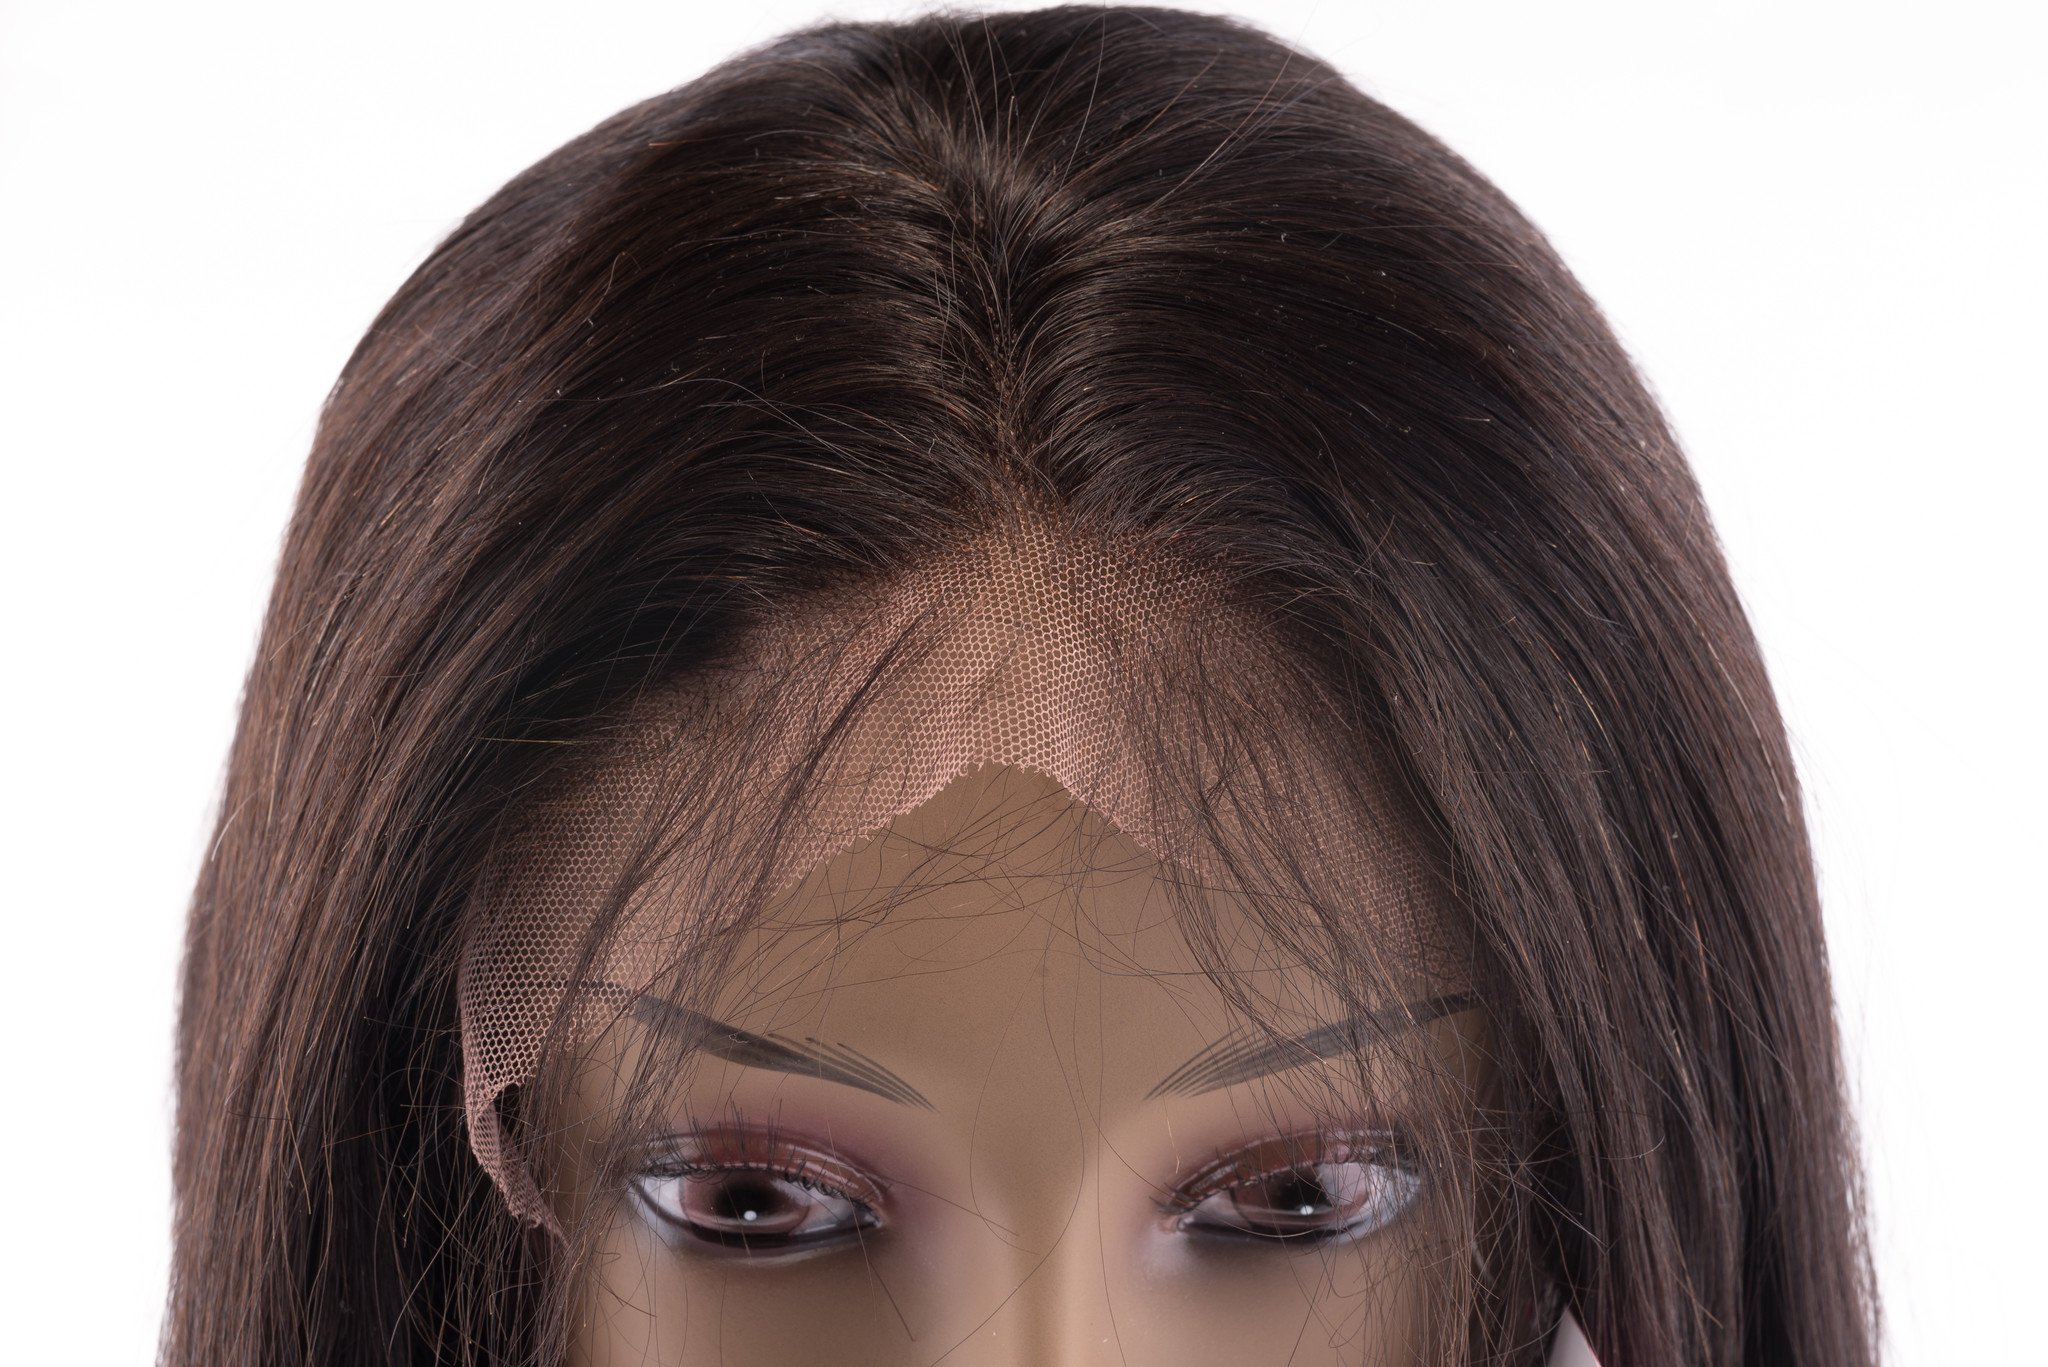 Shri SilverFox Shri Front Lace  Wig